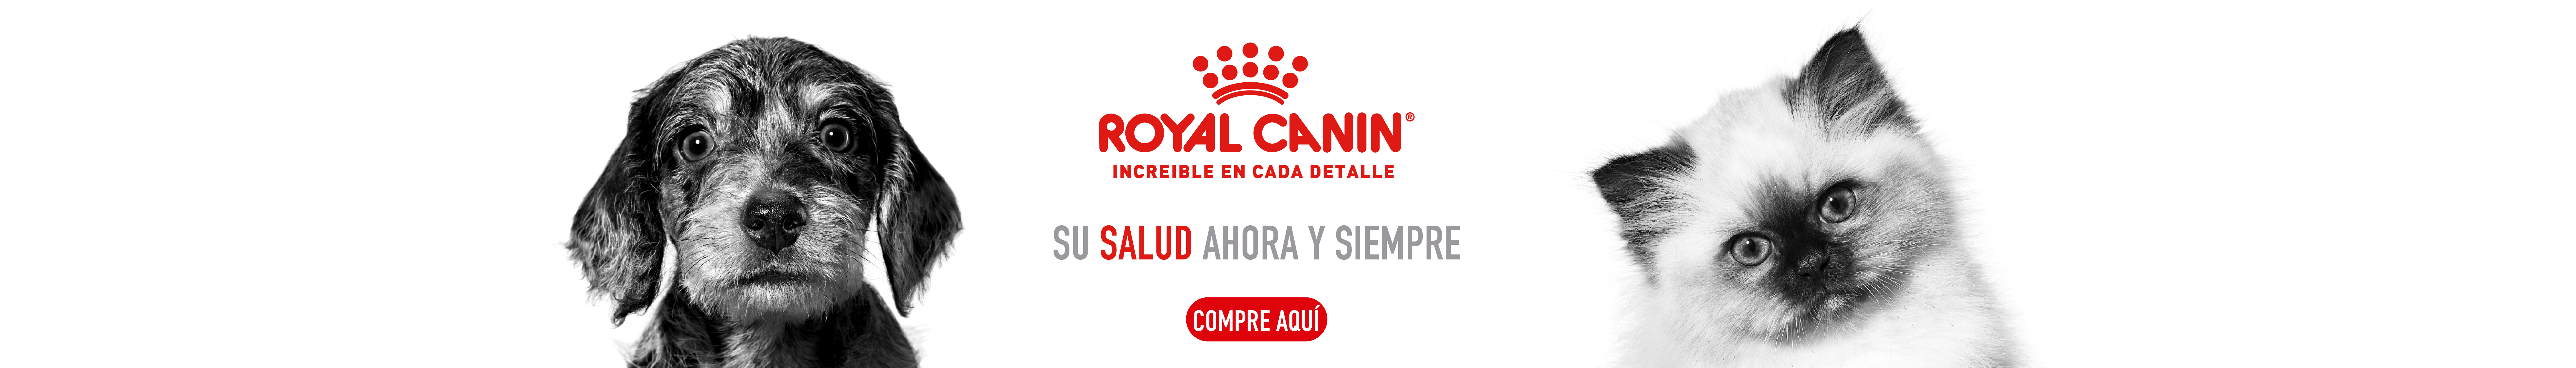 Royal Canin Marca